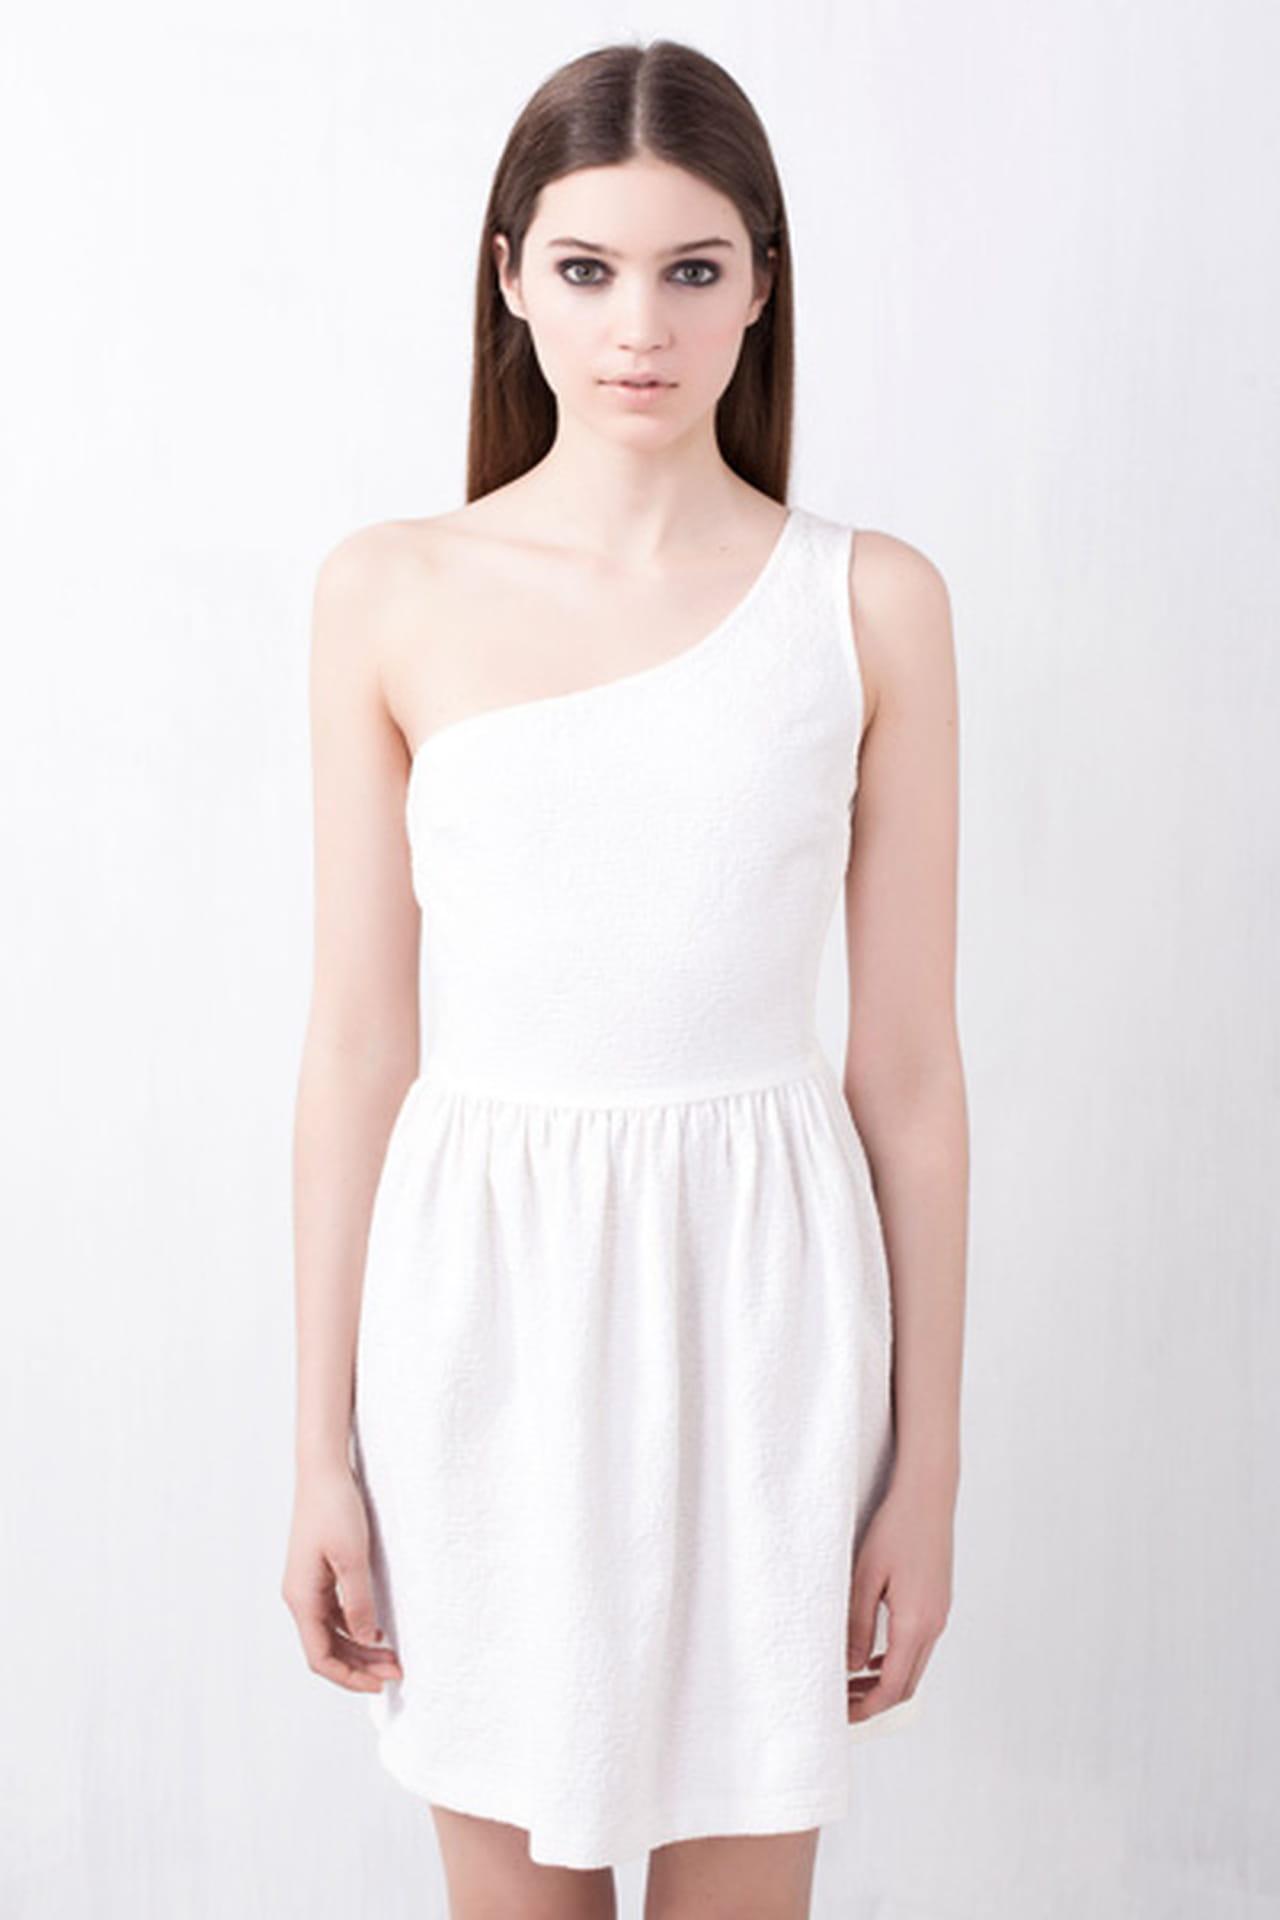 50fdc8b24af10 فستان بكمٍ واحد من Pull and Bear. فستان أبيض من Pull and Bear. من موضة صيف  2013